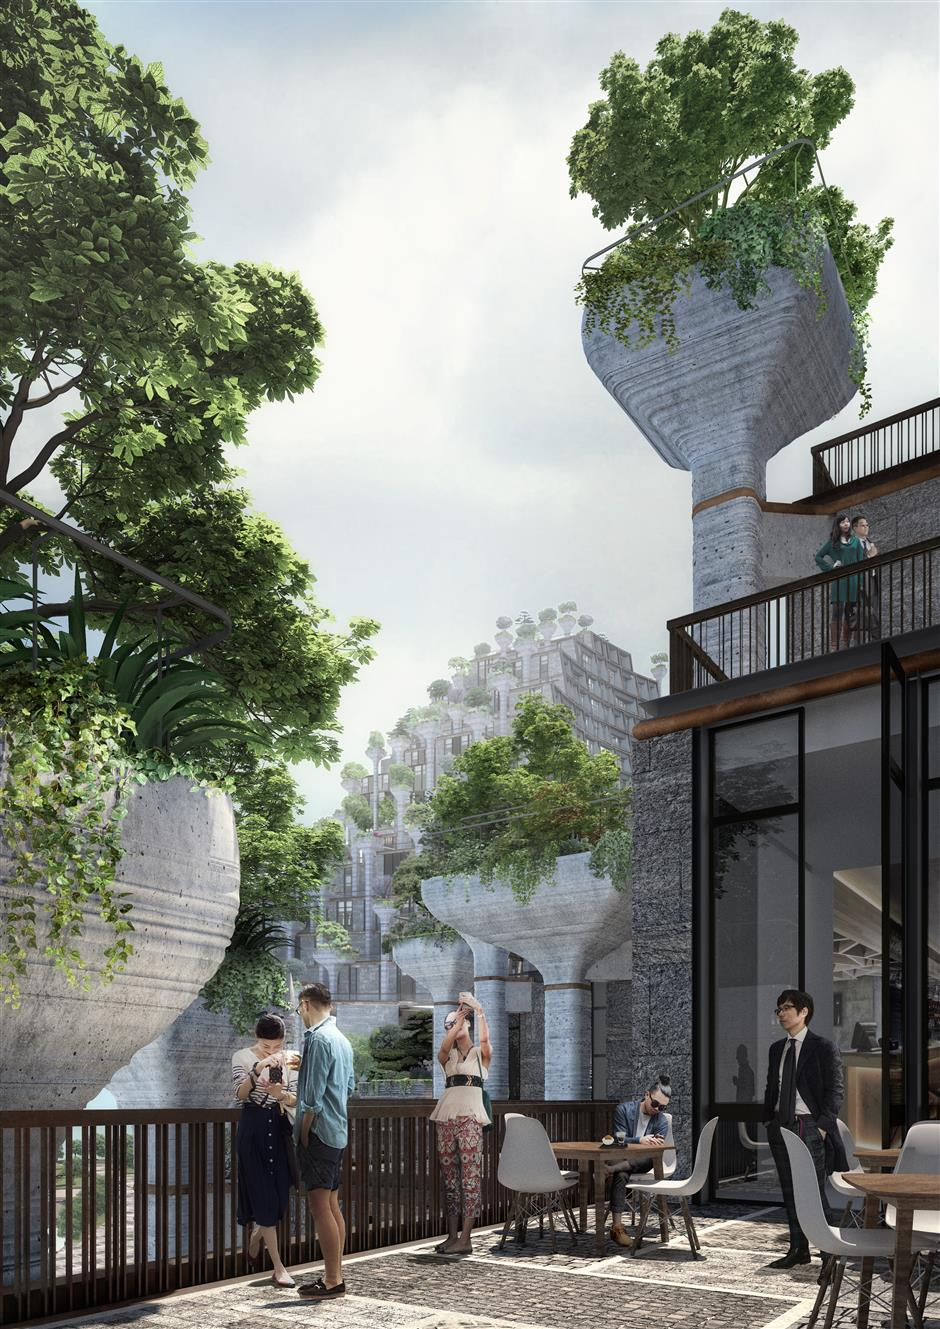 Hanging gardens with 1,000 trees take shape along Suzhou Creek